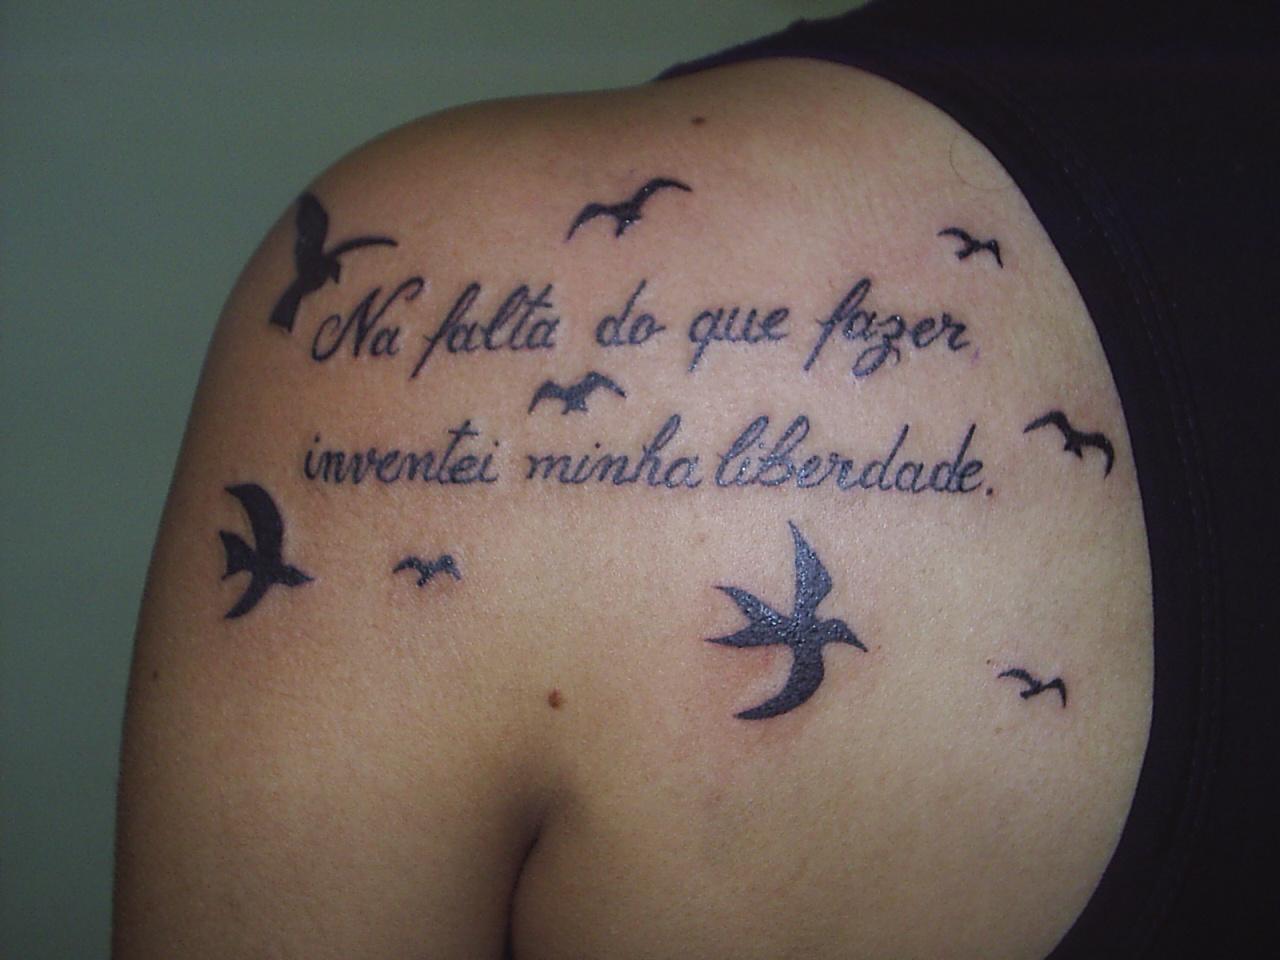 Tattoo frase com gaivotas cliente rafaela cultura e liberdade tattoo frase com gaivotas cliente rafaela altavistaventures Gallery